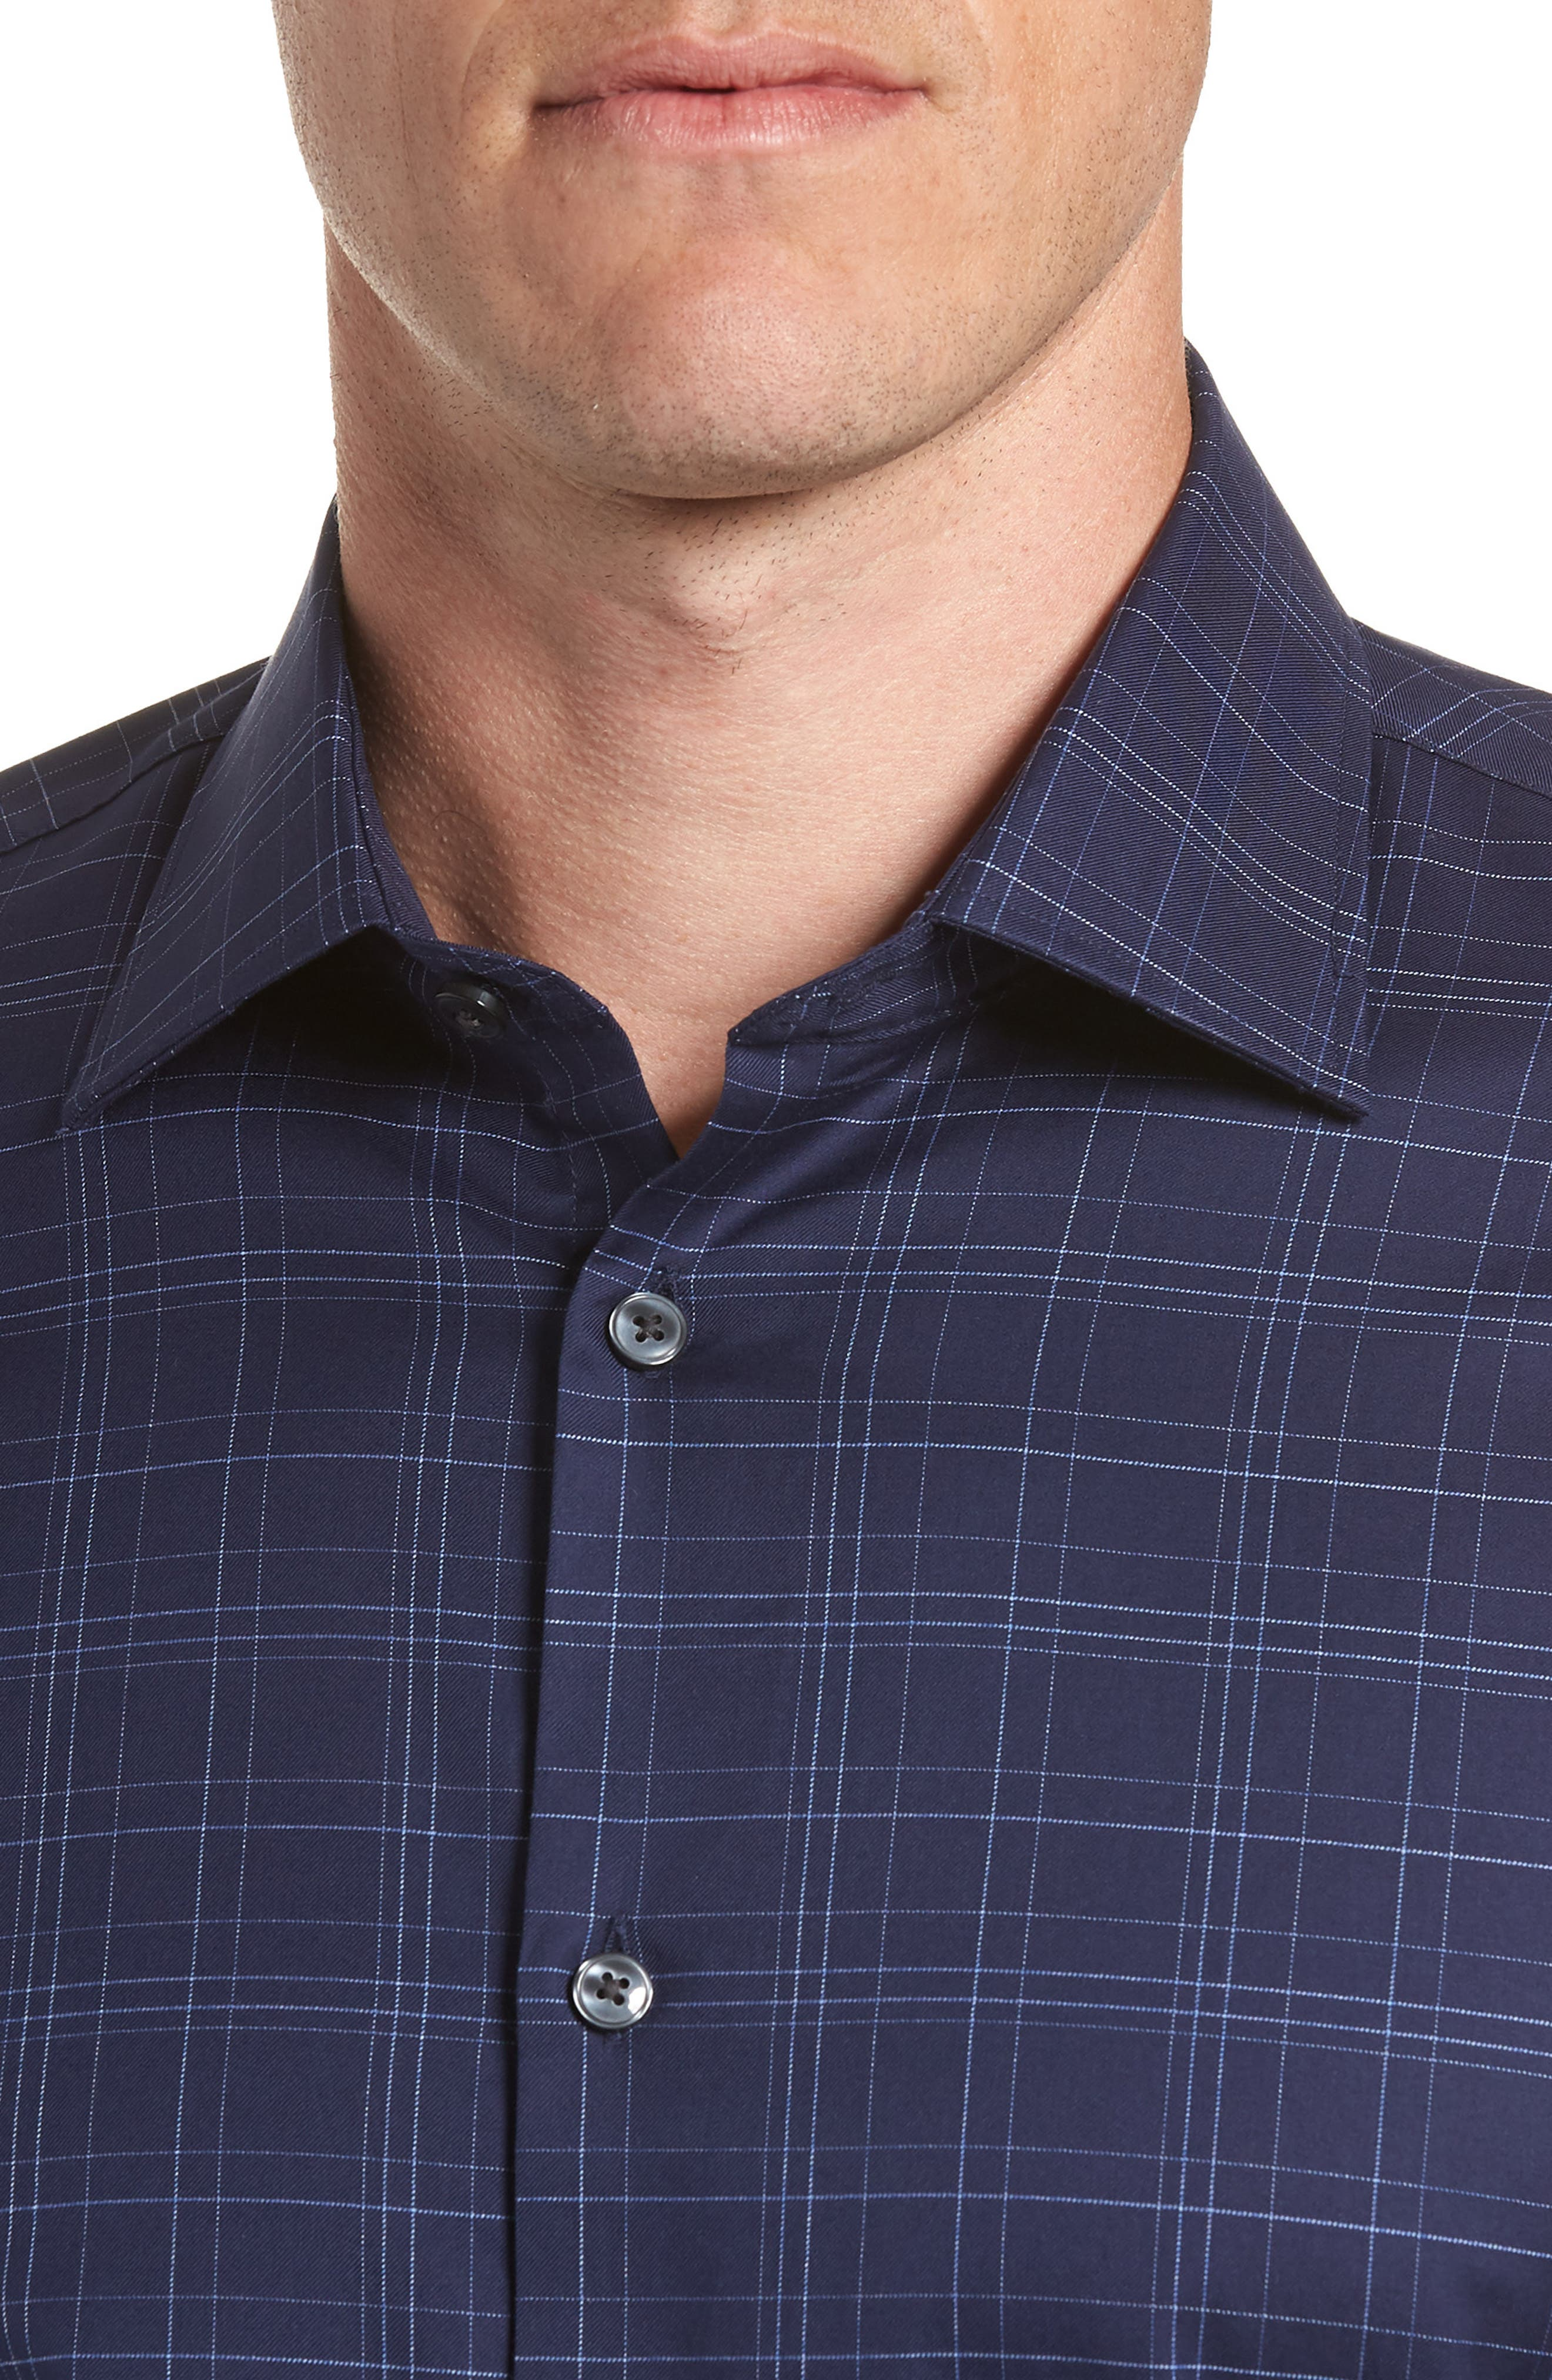 Windowpane Plaid Regular Fit Dress Shirt,                             Alternate thumbnail 2, color,                             INDIGO